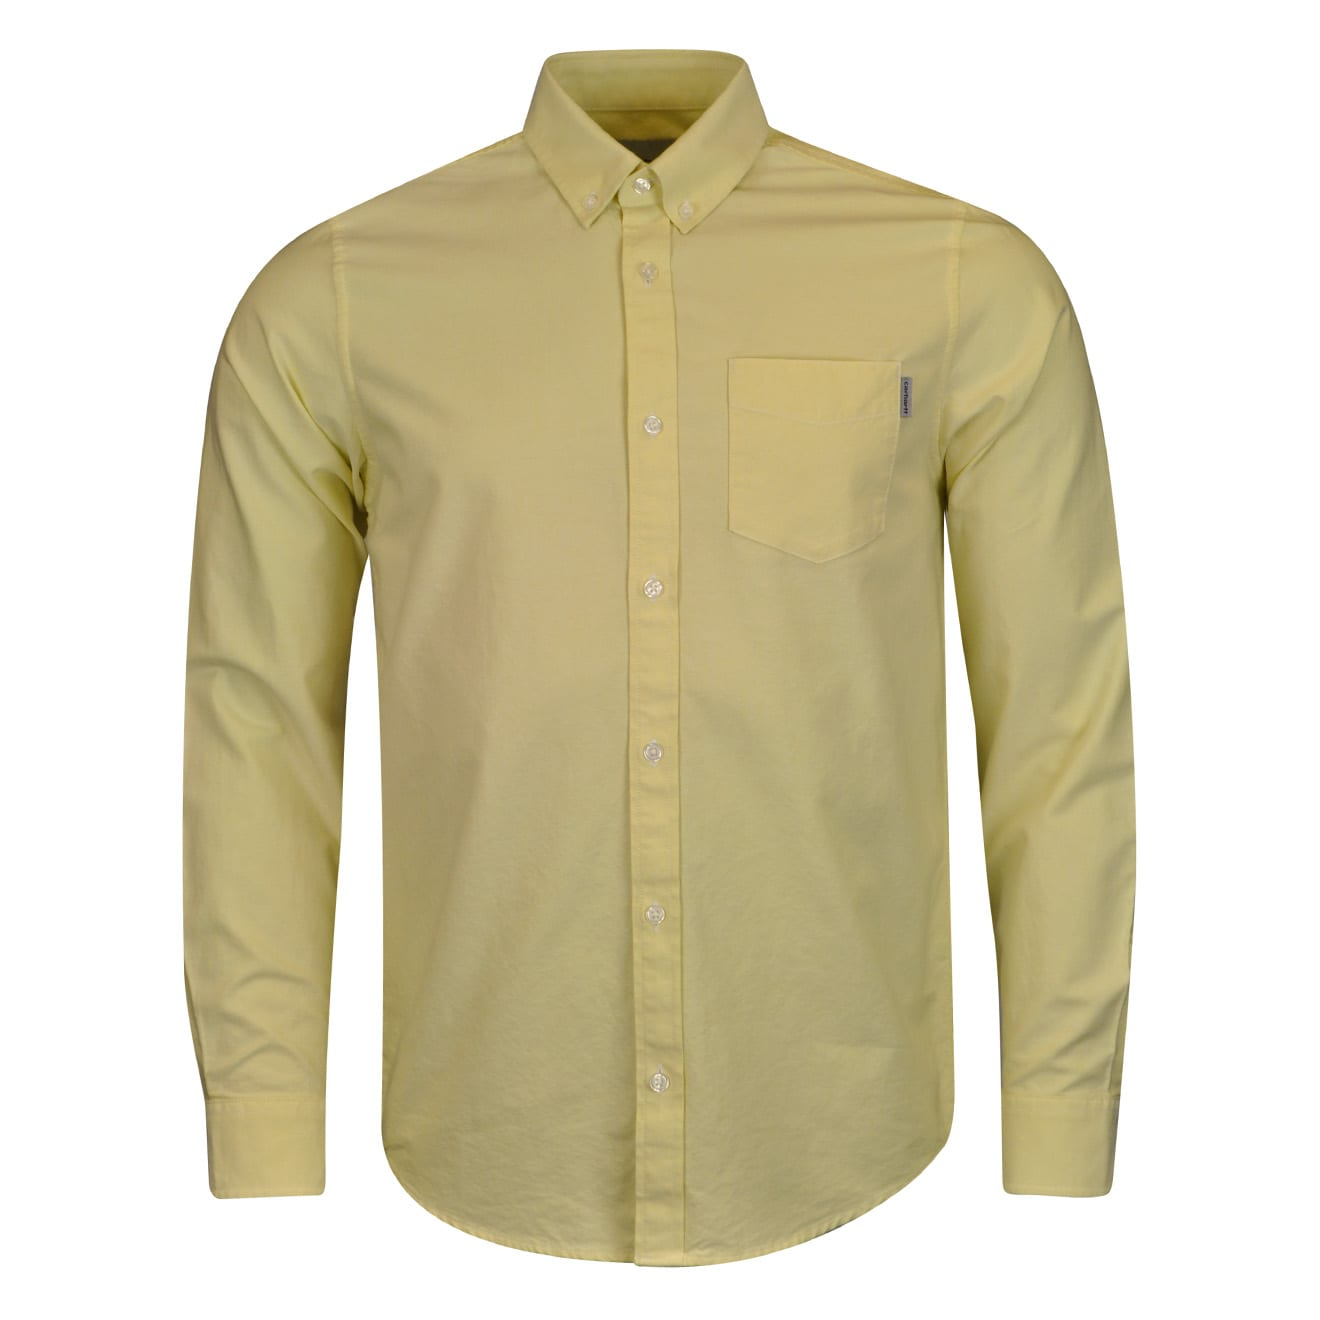 Carhartt L/S Button Down Pocket Shirt Citrine